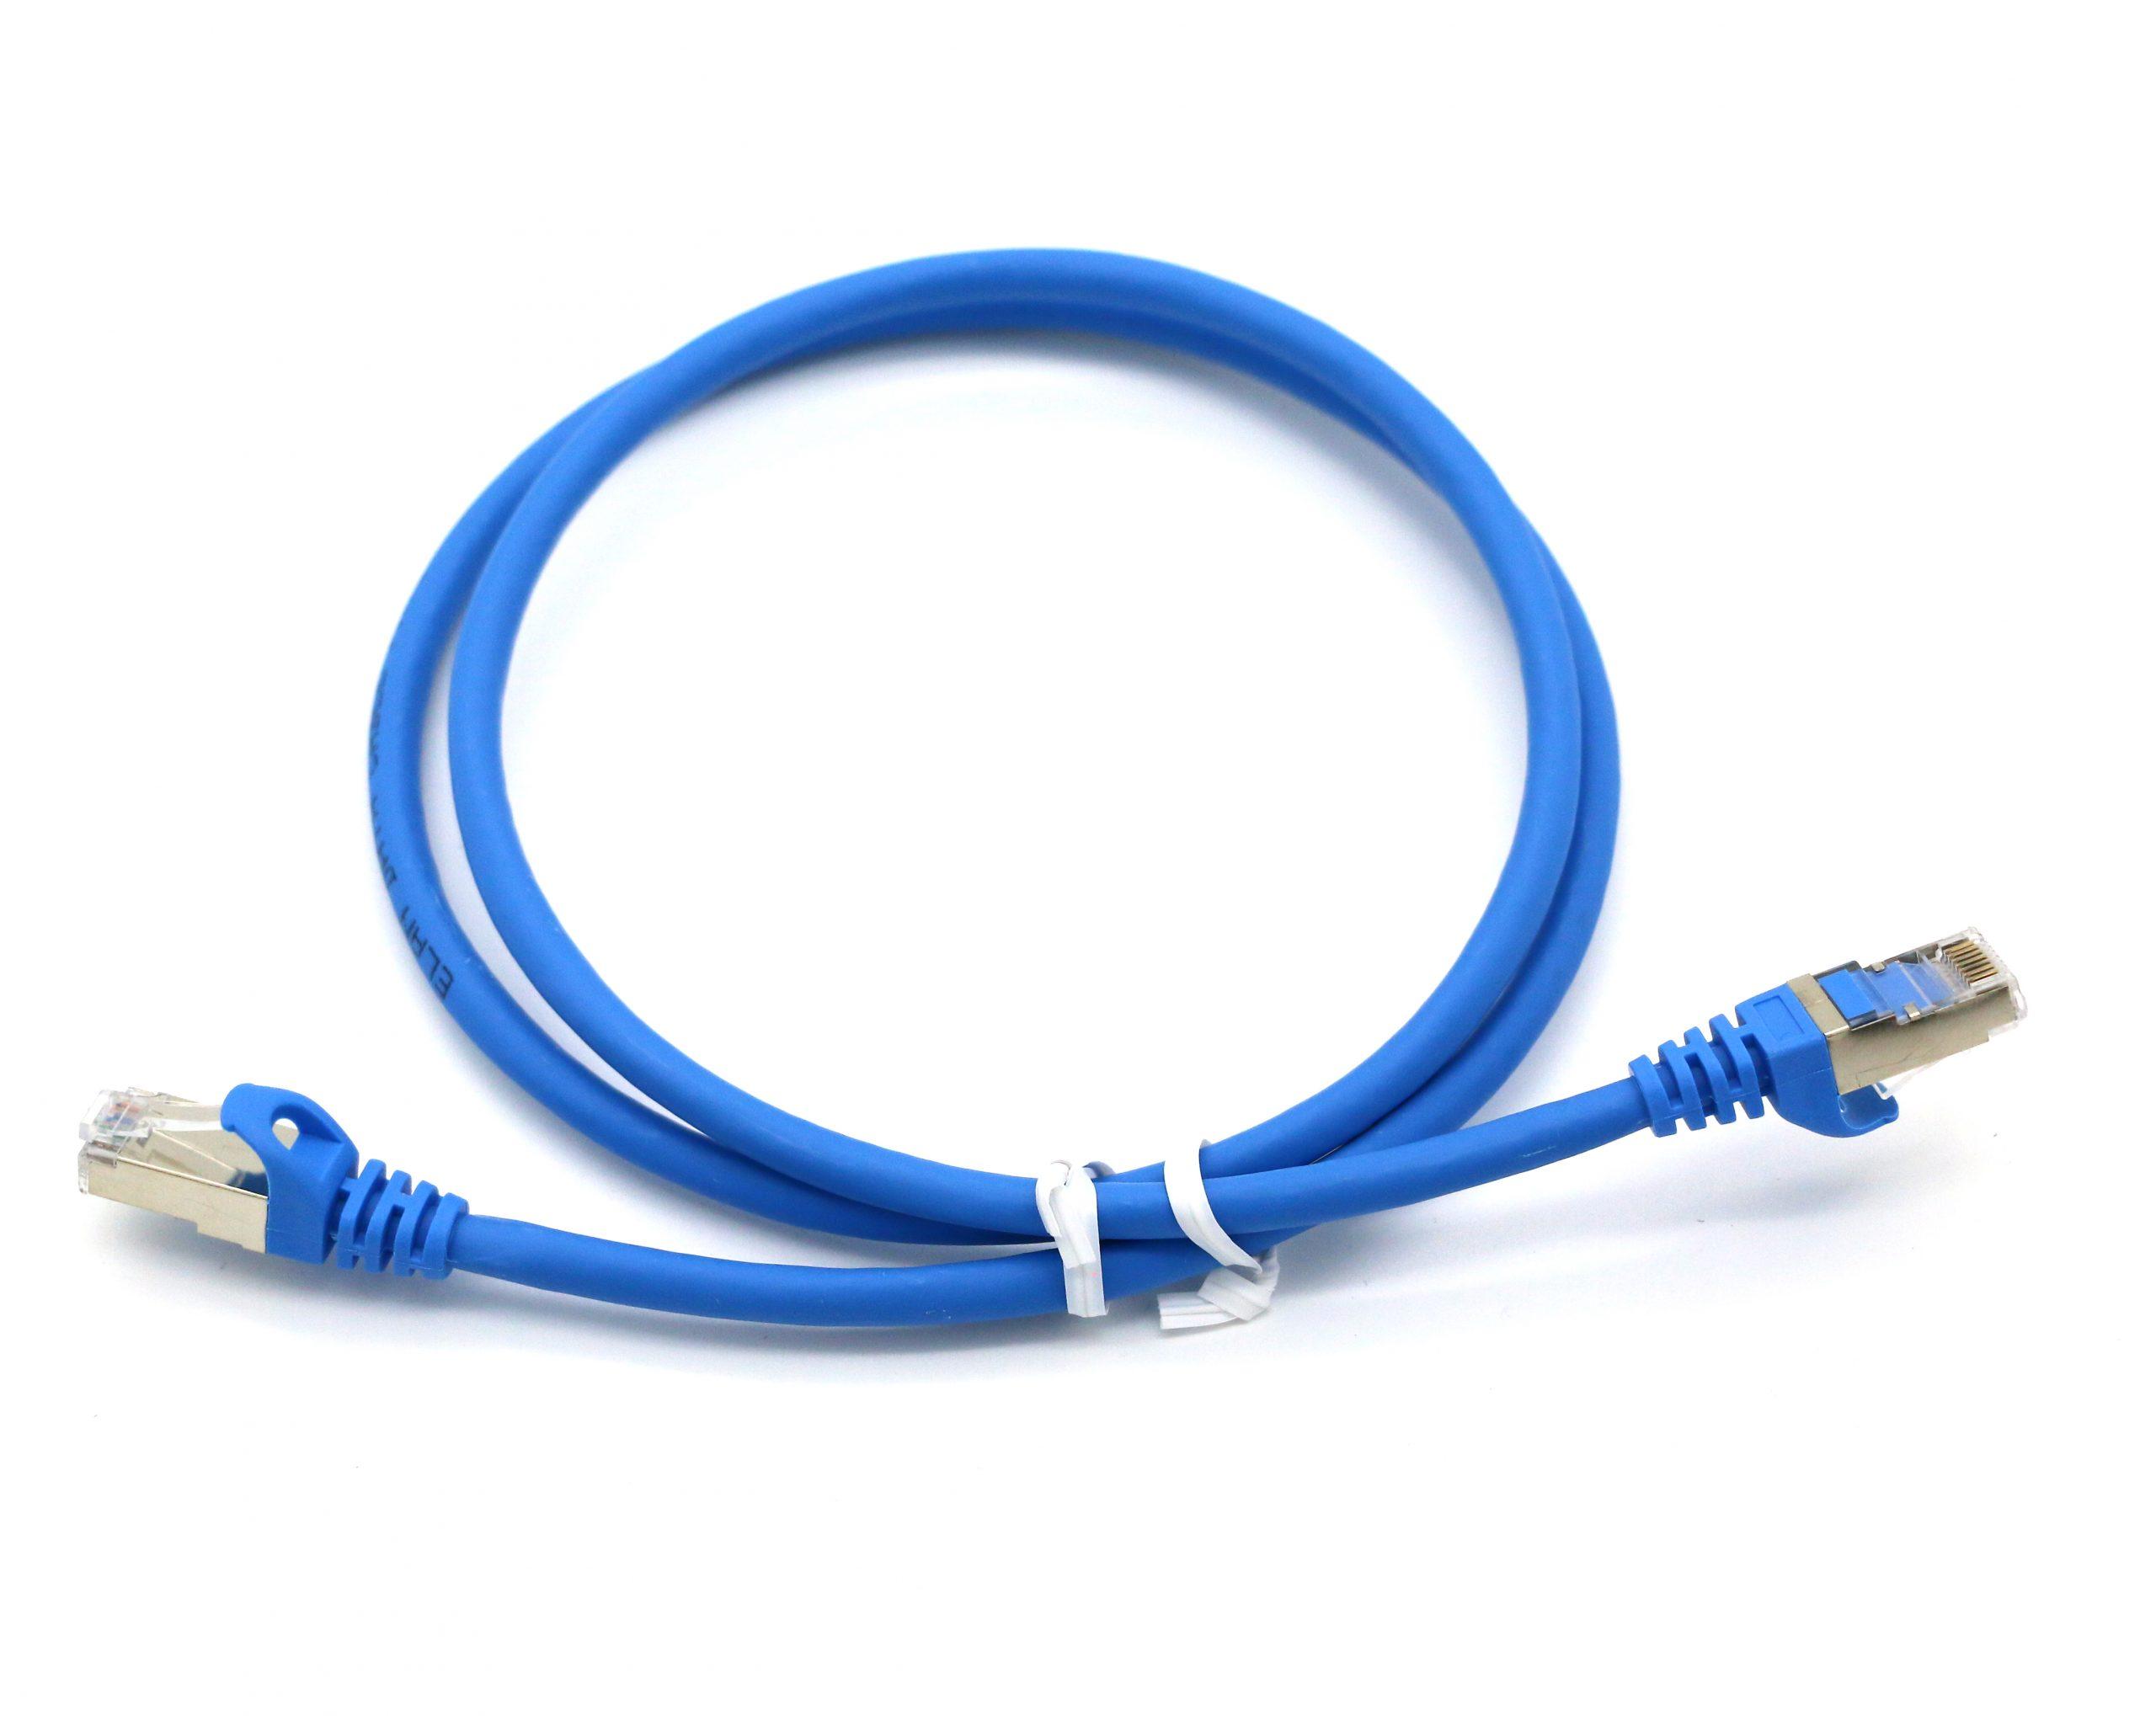 eLan Category 6A S/FTP patch cord blue RJ45, 1m